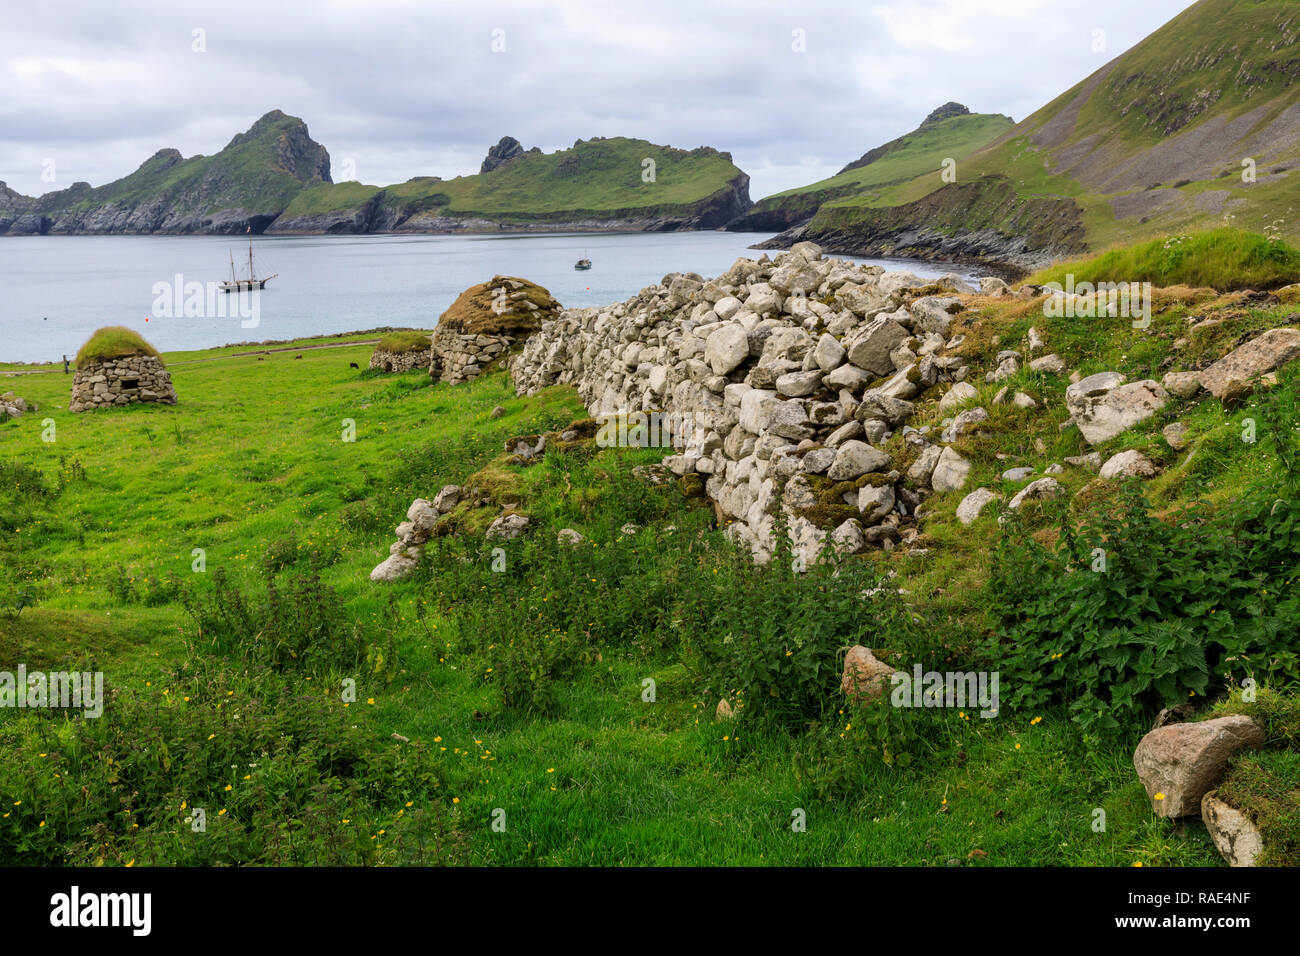 Cleits, food stores and Village Bay, evacuated village, Hirta, remote St. Kilda Archipelago, UNESCO, Outer Hebrides, Scotland, United Kingdom - Stock Image